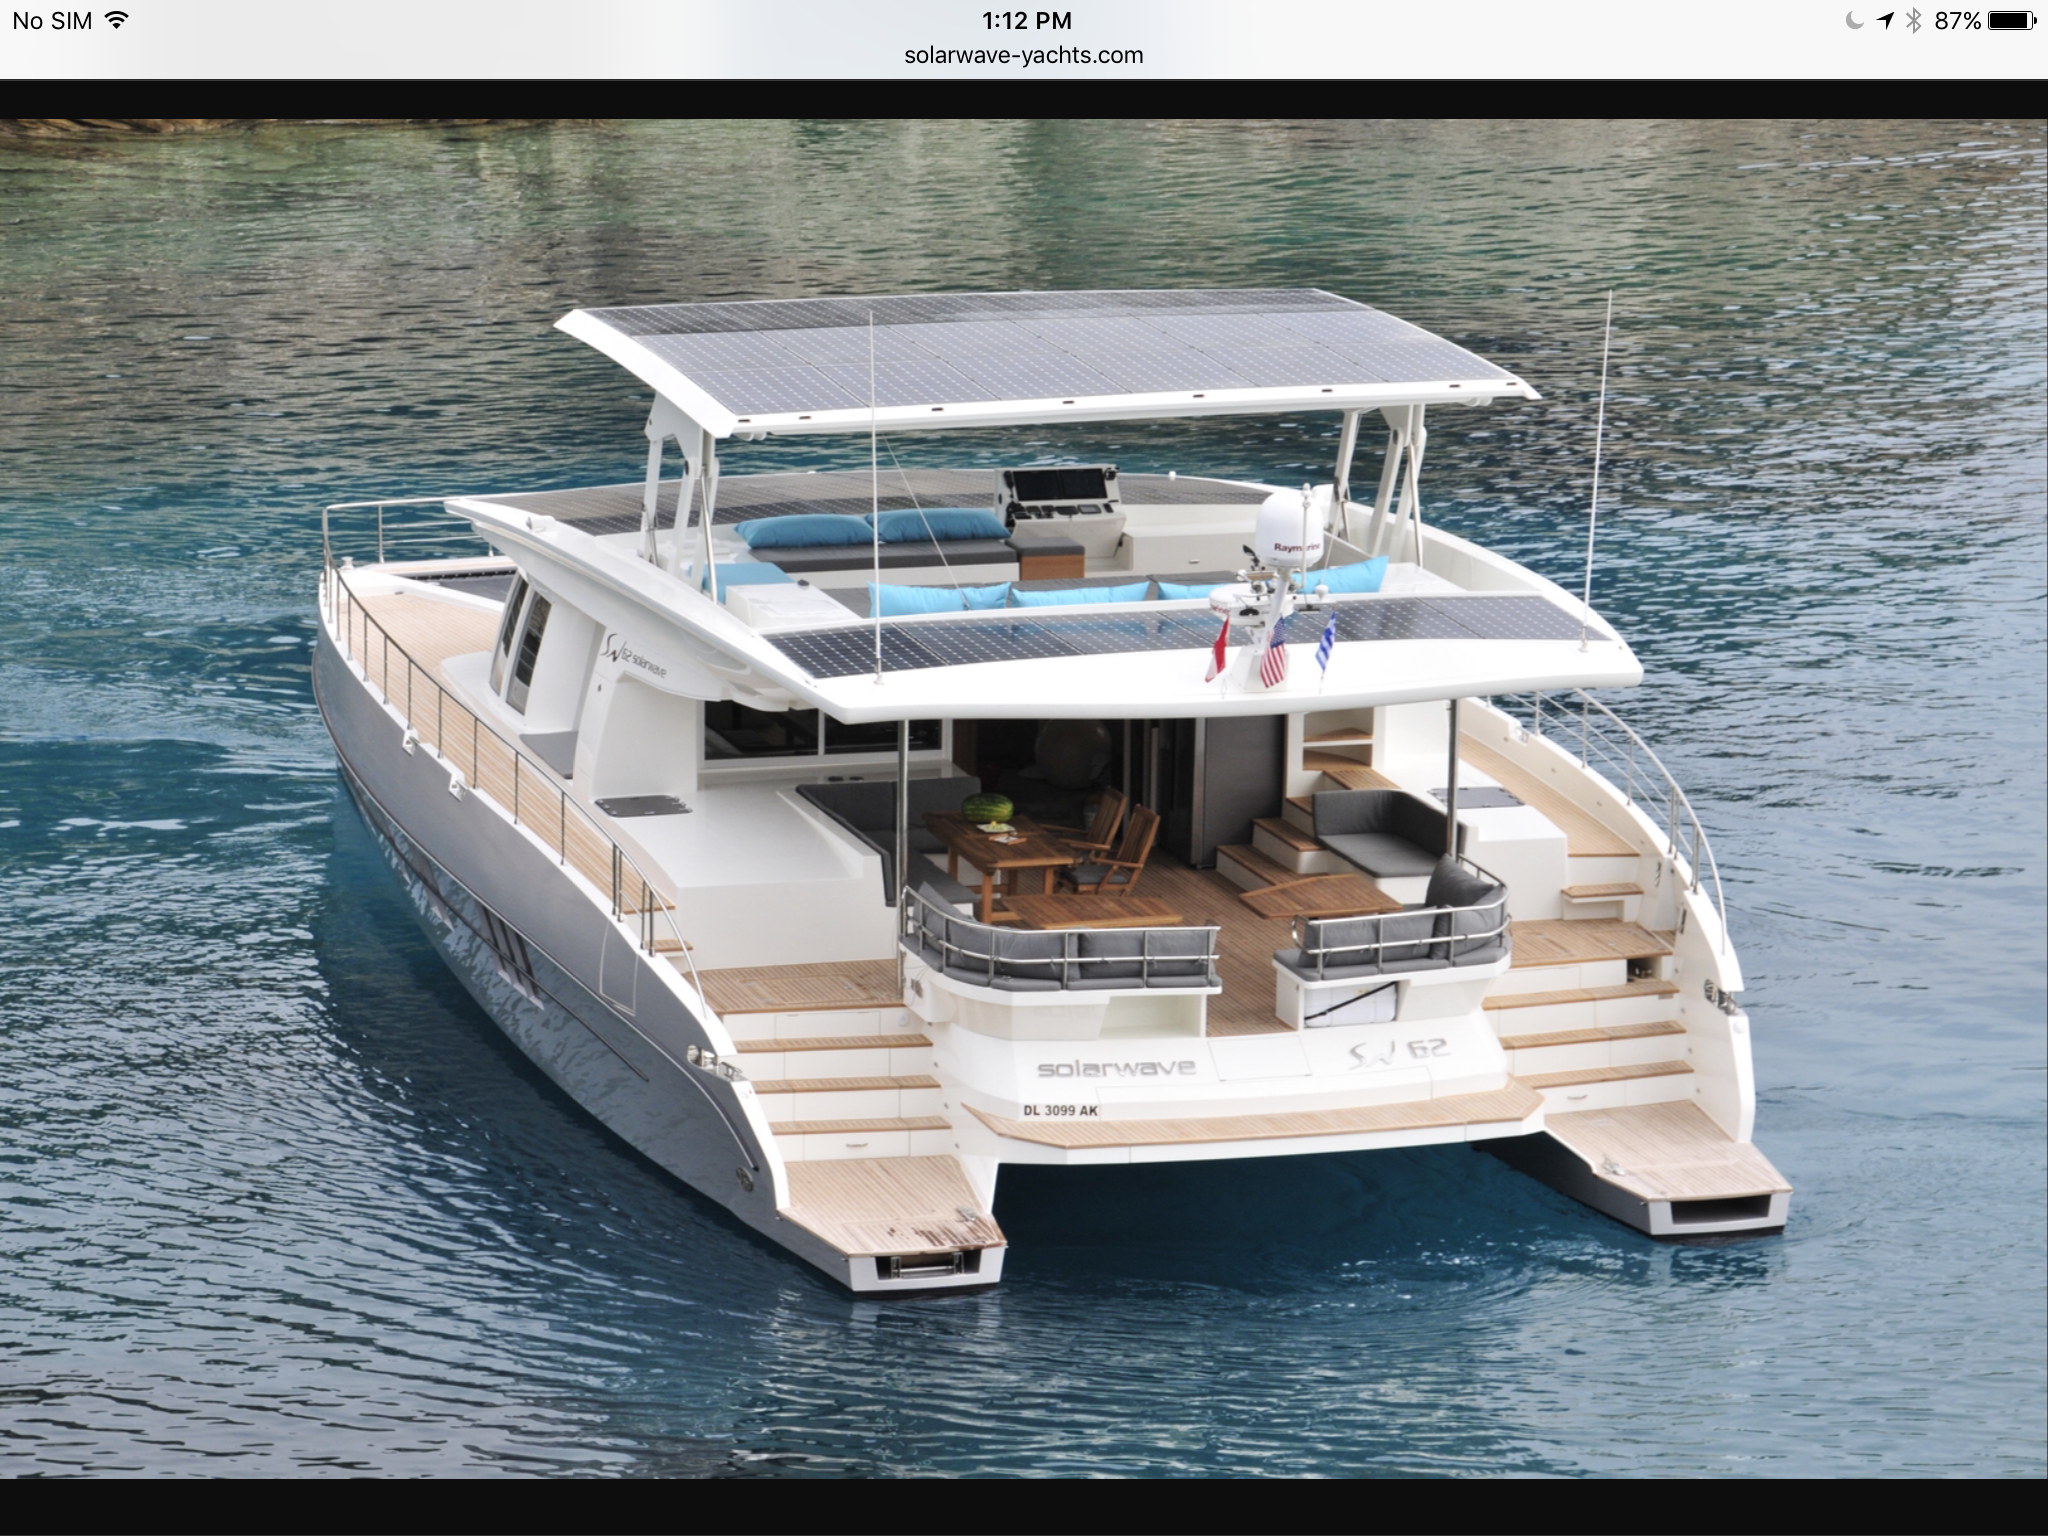 bayliner no cruisers look cabins auction reserve ciera cruiser day cabin sunbridge auctionno